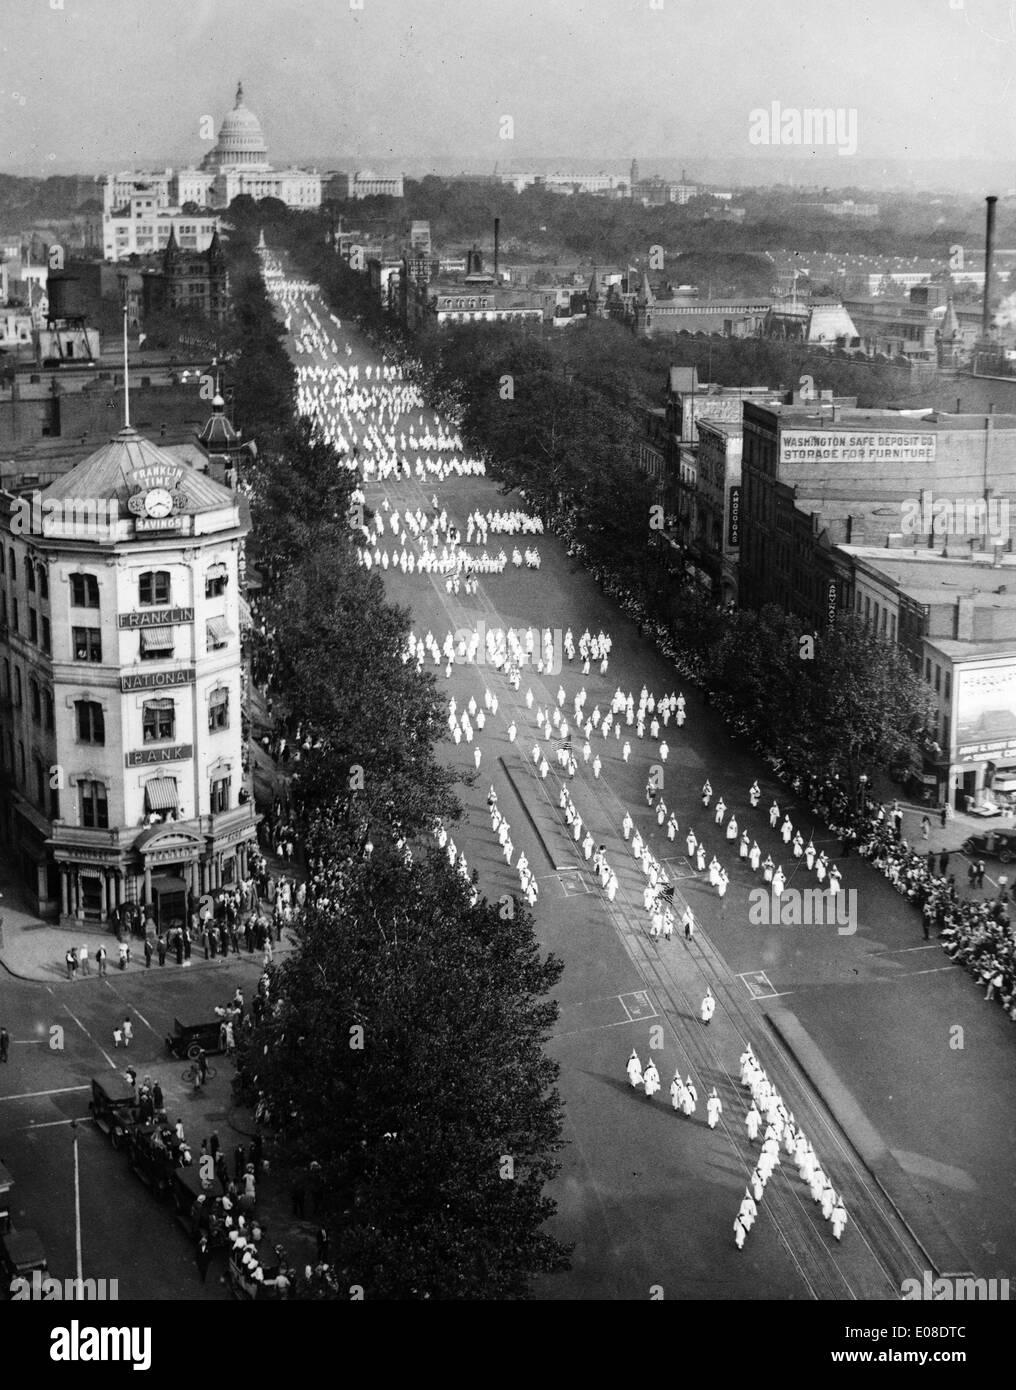 Ku Klux Klan parade, United States of America - Stock Image